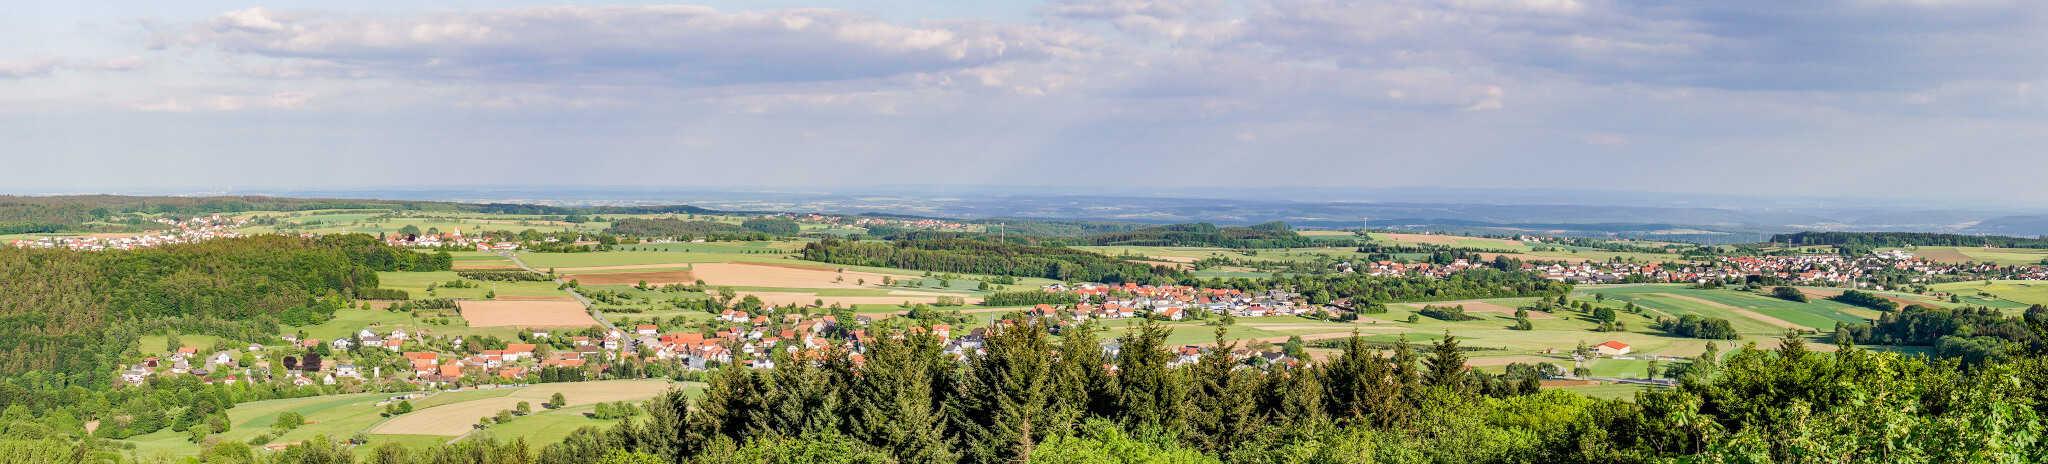 Panorama Aussichtsturm Katzenbuckel